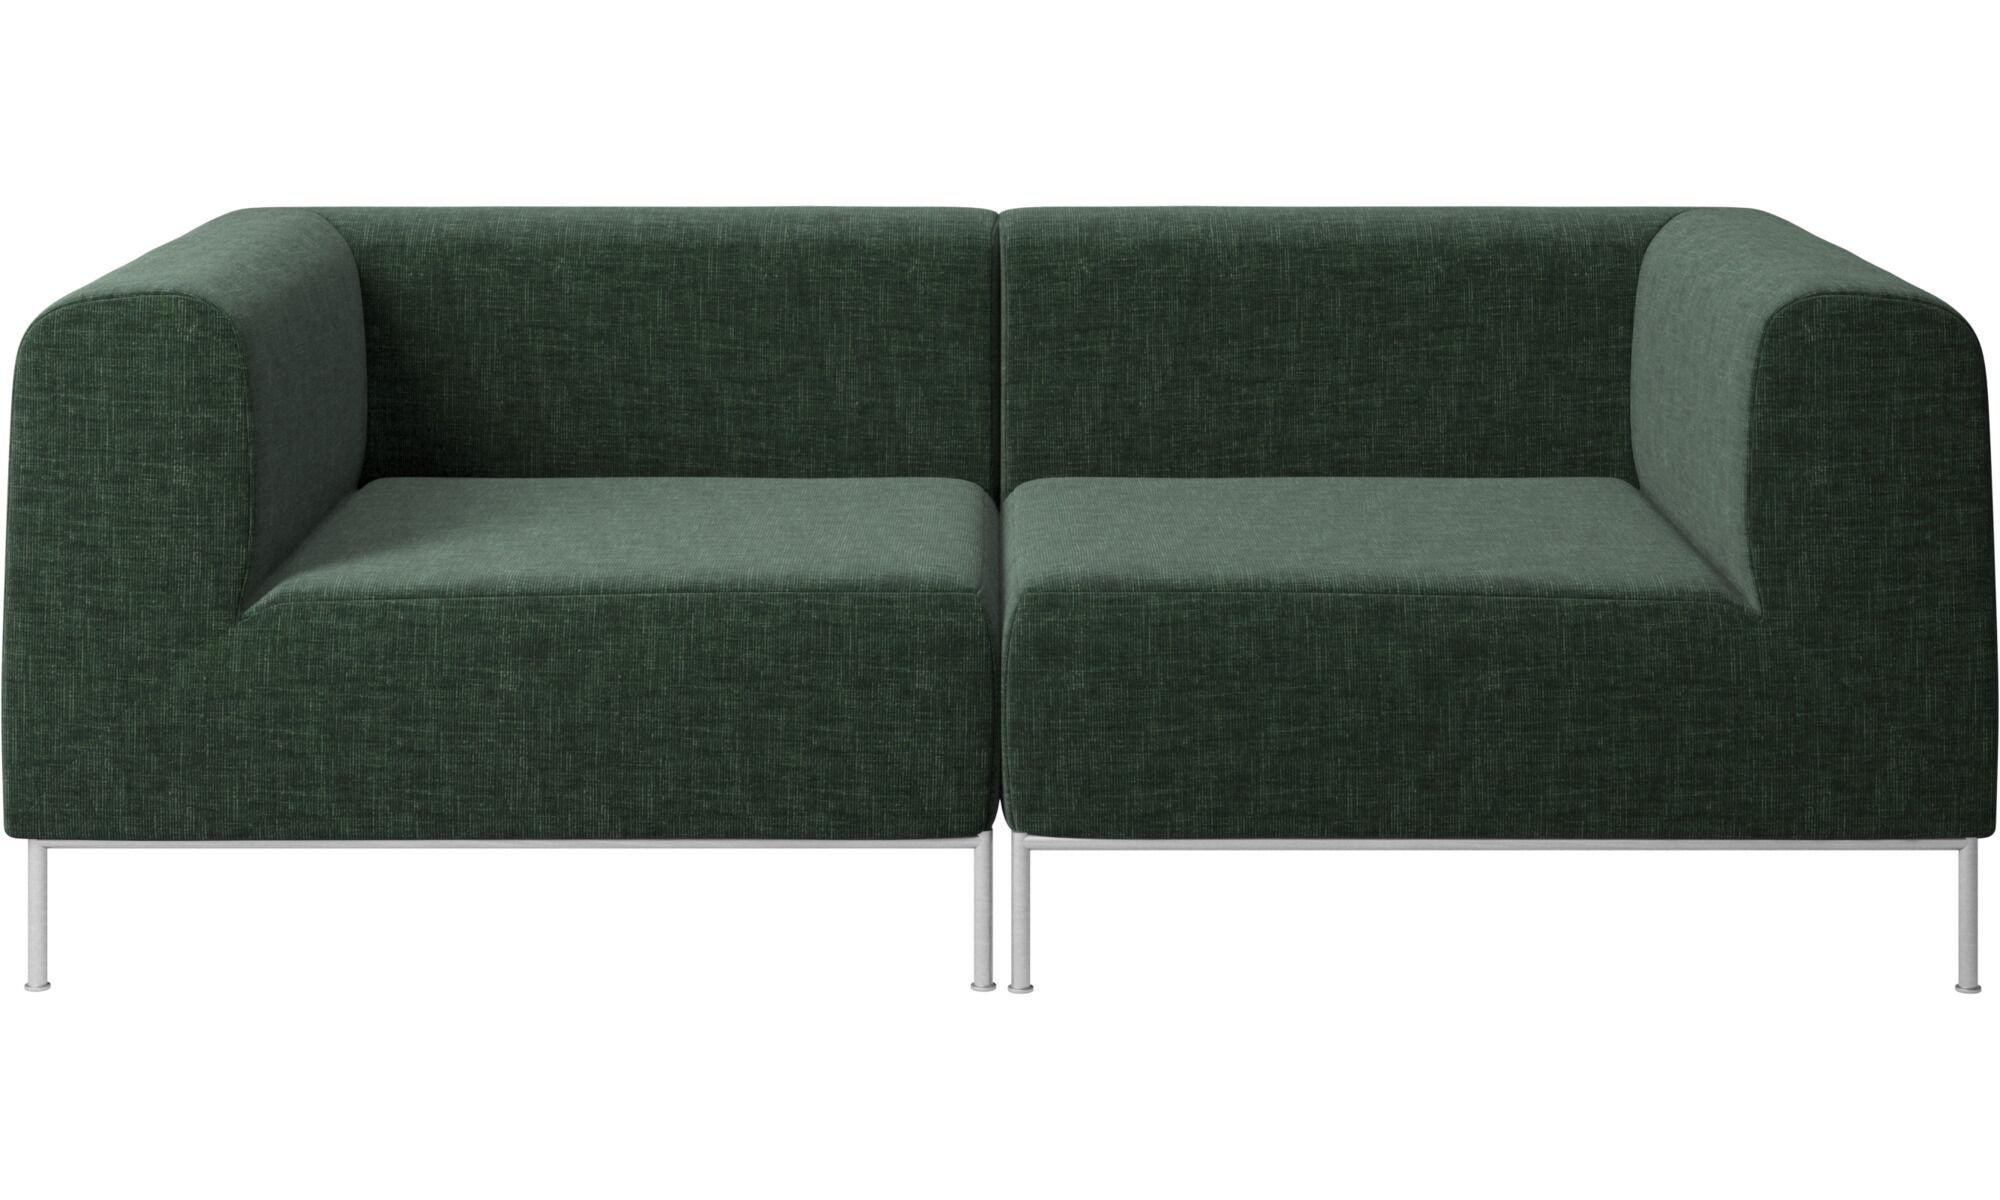 Modular Sofas   Miami Sofa   Green   Fabric